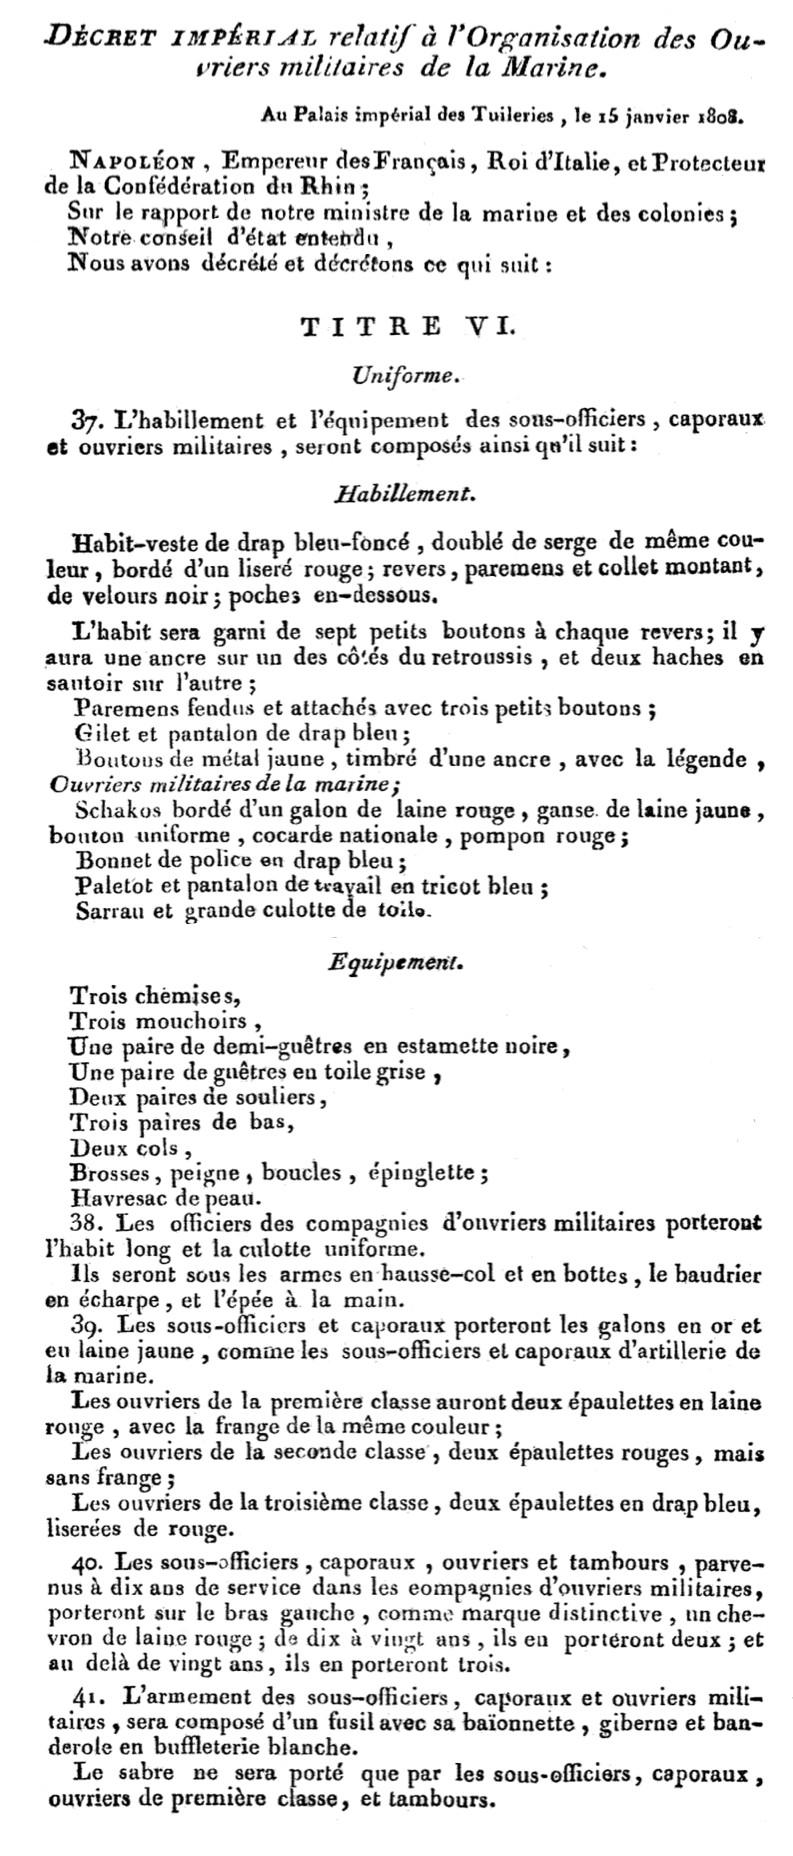 Vitrine Alain 2 Voltigeur de ligne 1812 MM54mm - Page 8 18090307475110262915876082